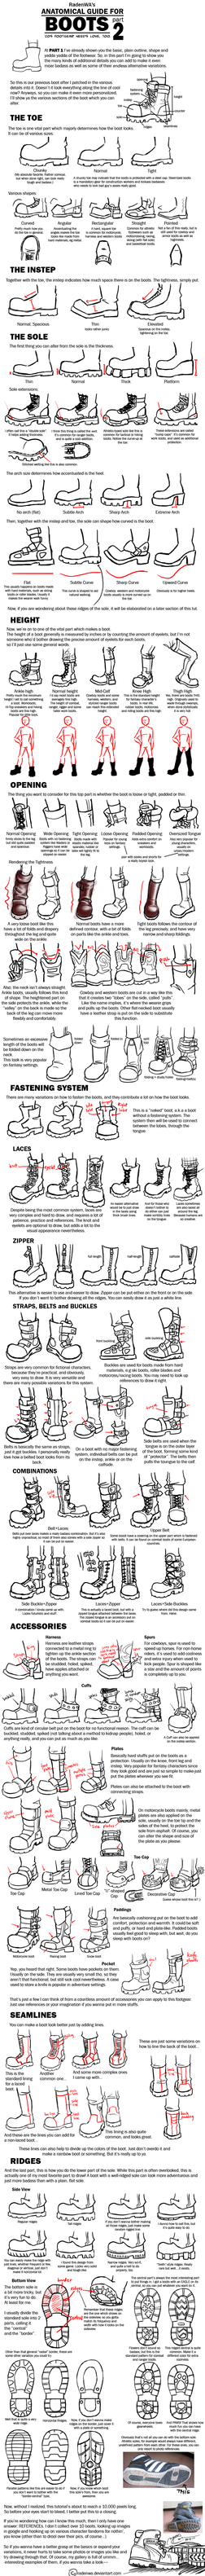 WA's BOOT Anatomy Tutorial Pt2 by RadenWA